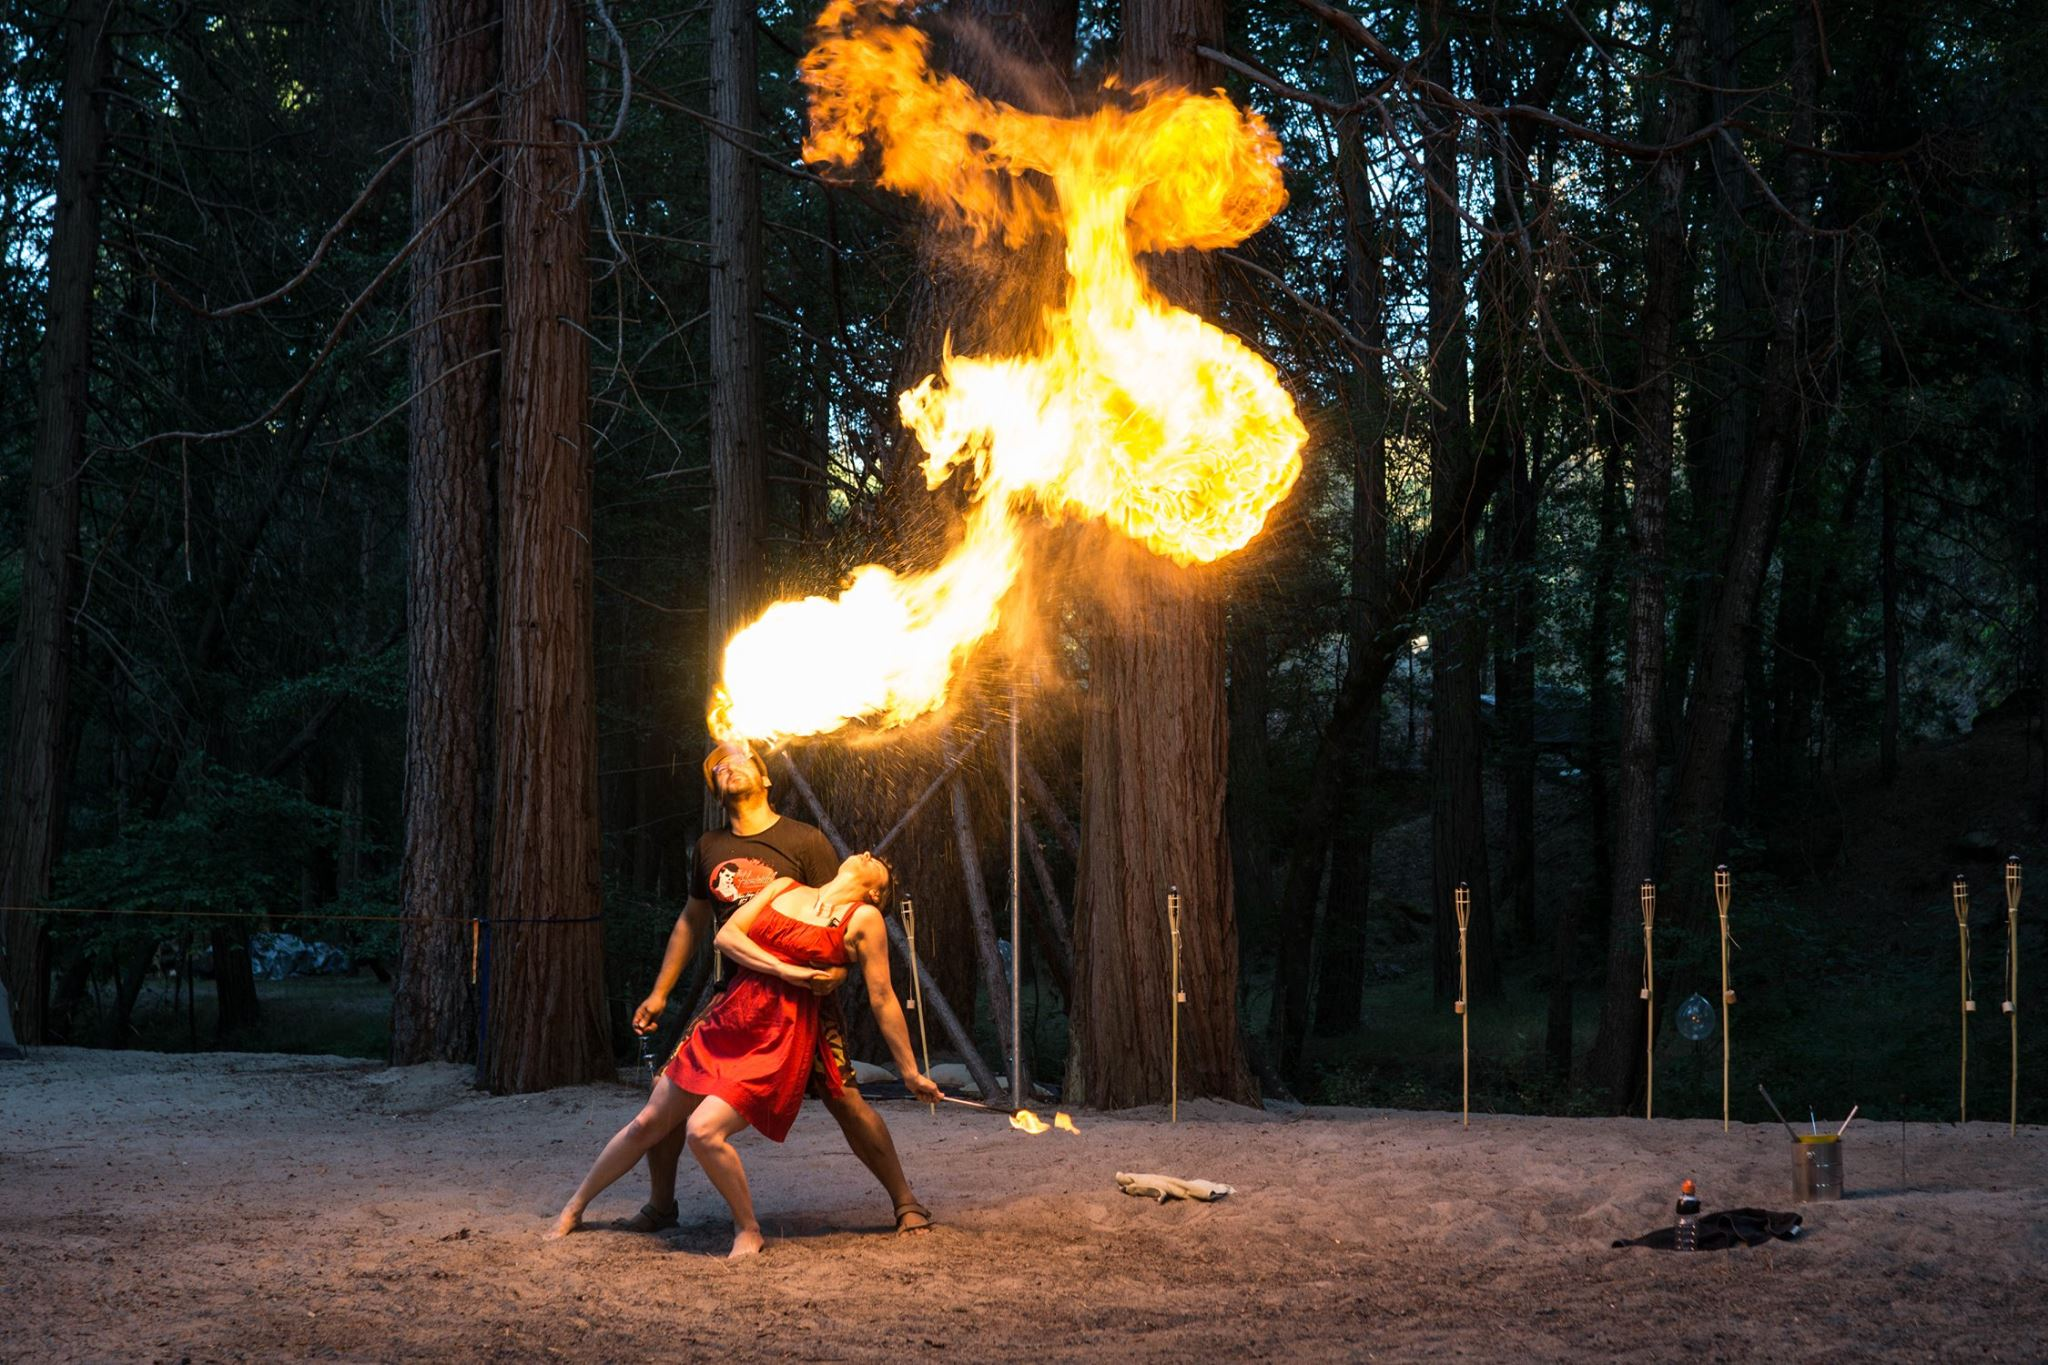 fire-breath-kim-lawson.jpg